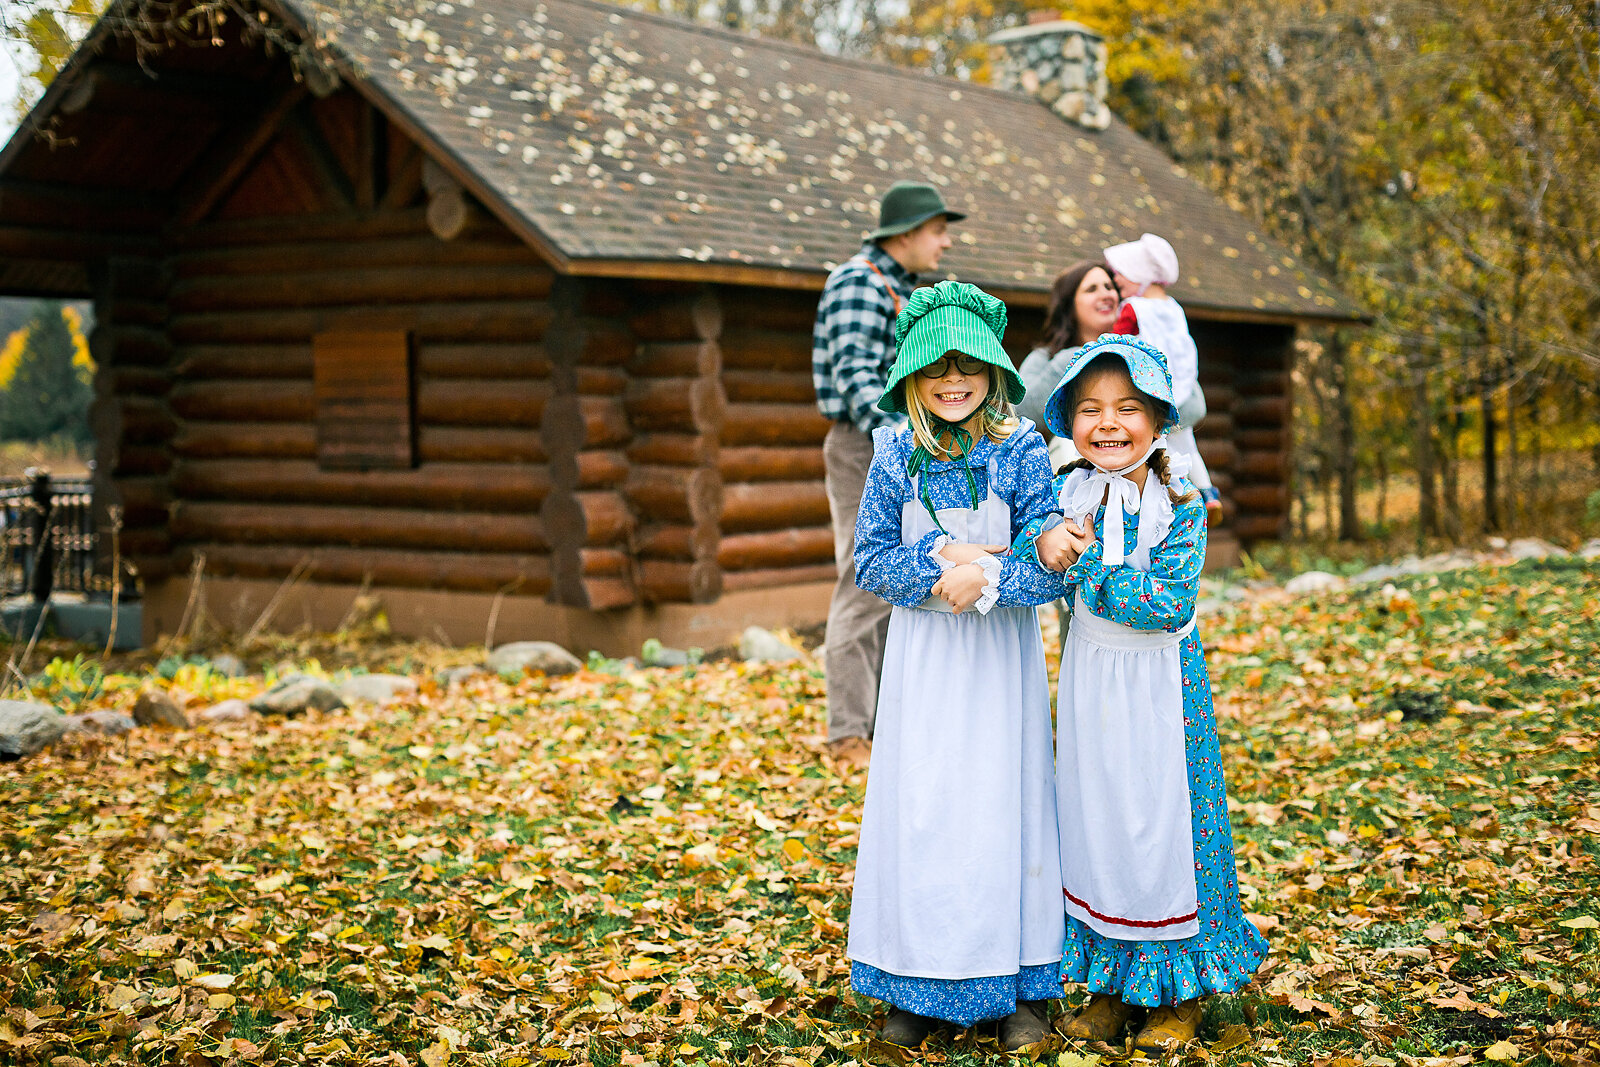 ingalls_family_halloween_005.jpg